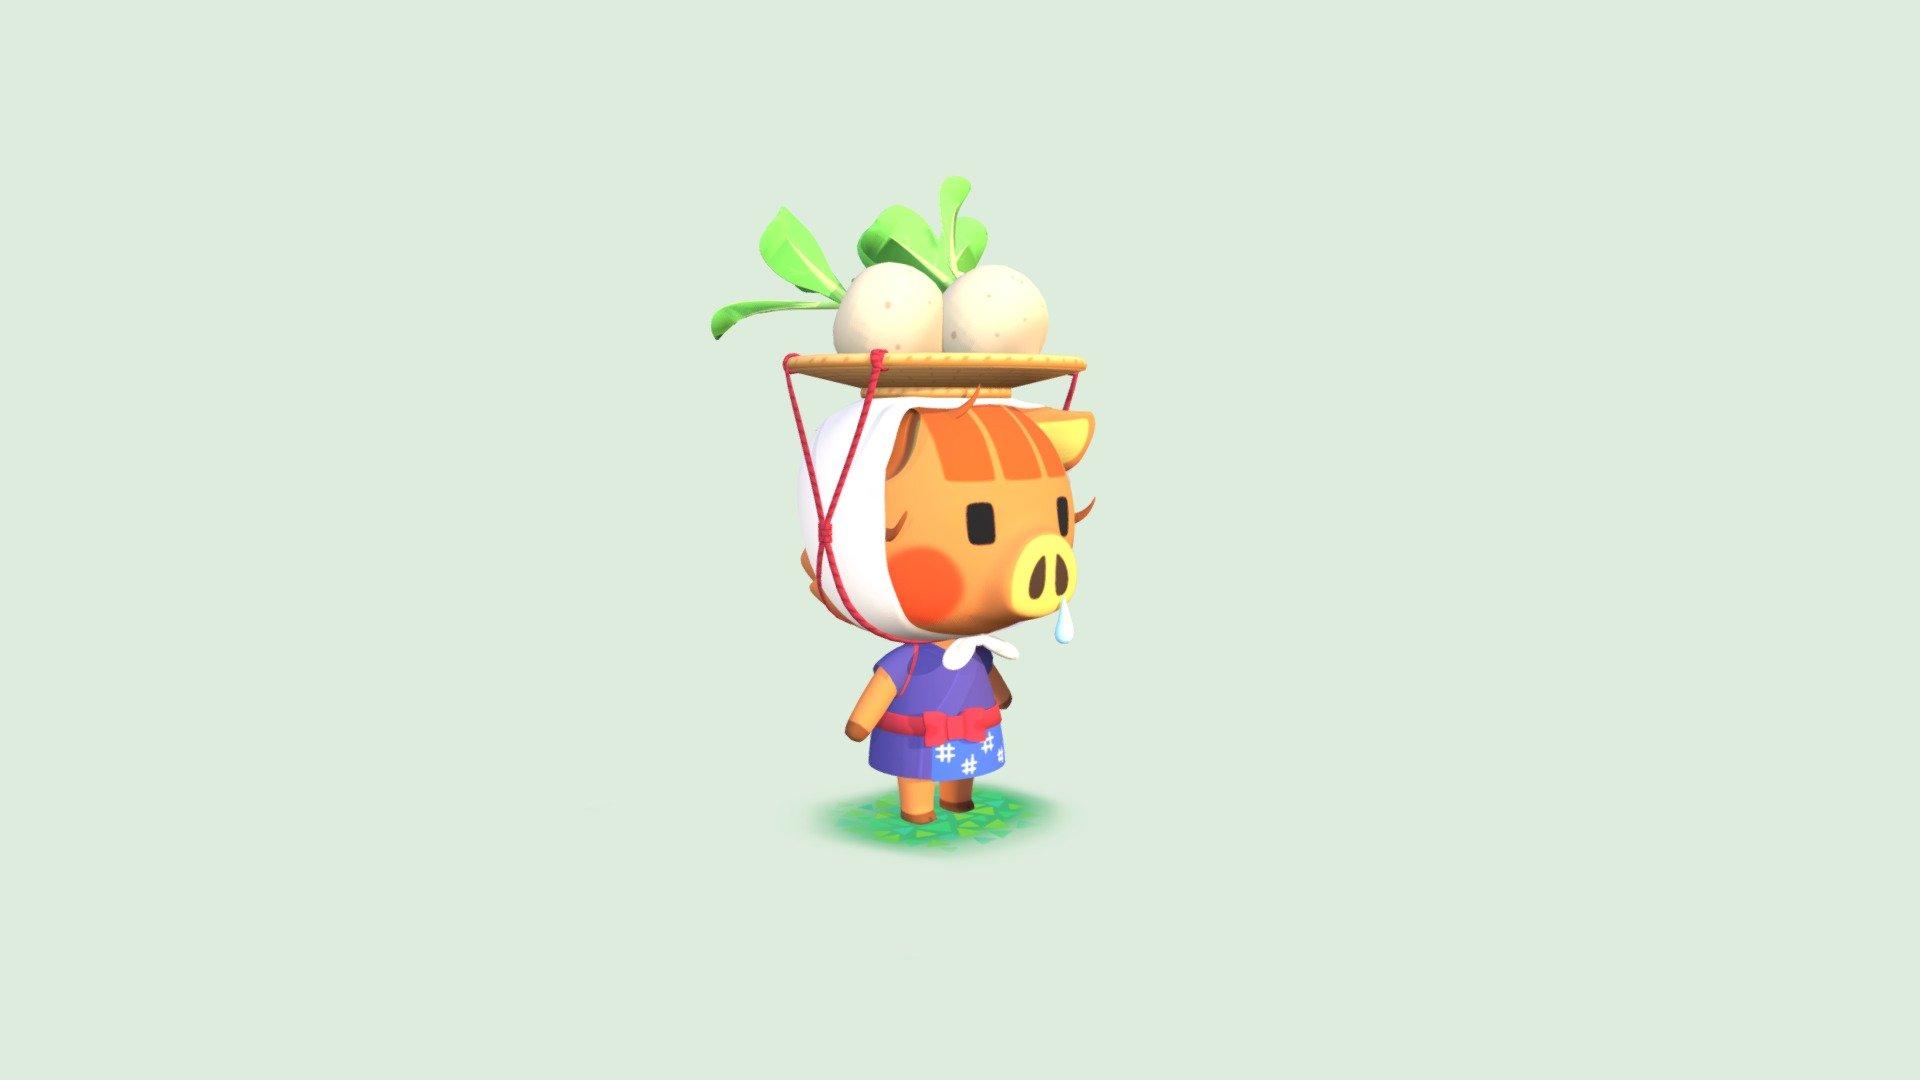 Daisy Mae Animal Crossing New Horizons 3d Model By Katieemmaw Katieemmaw 0ad931f Sketchfab